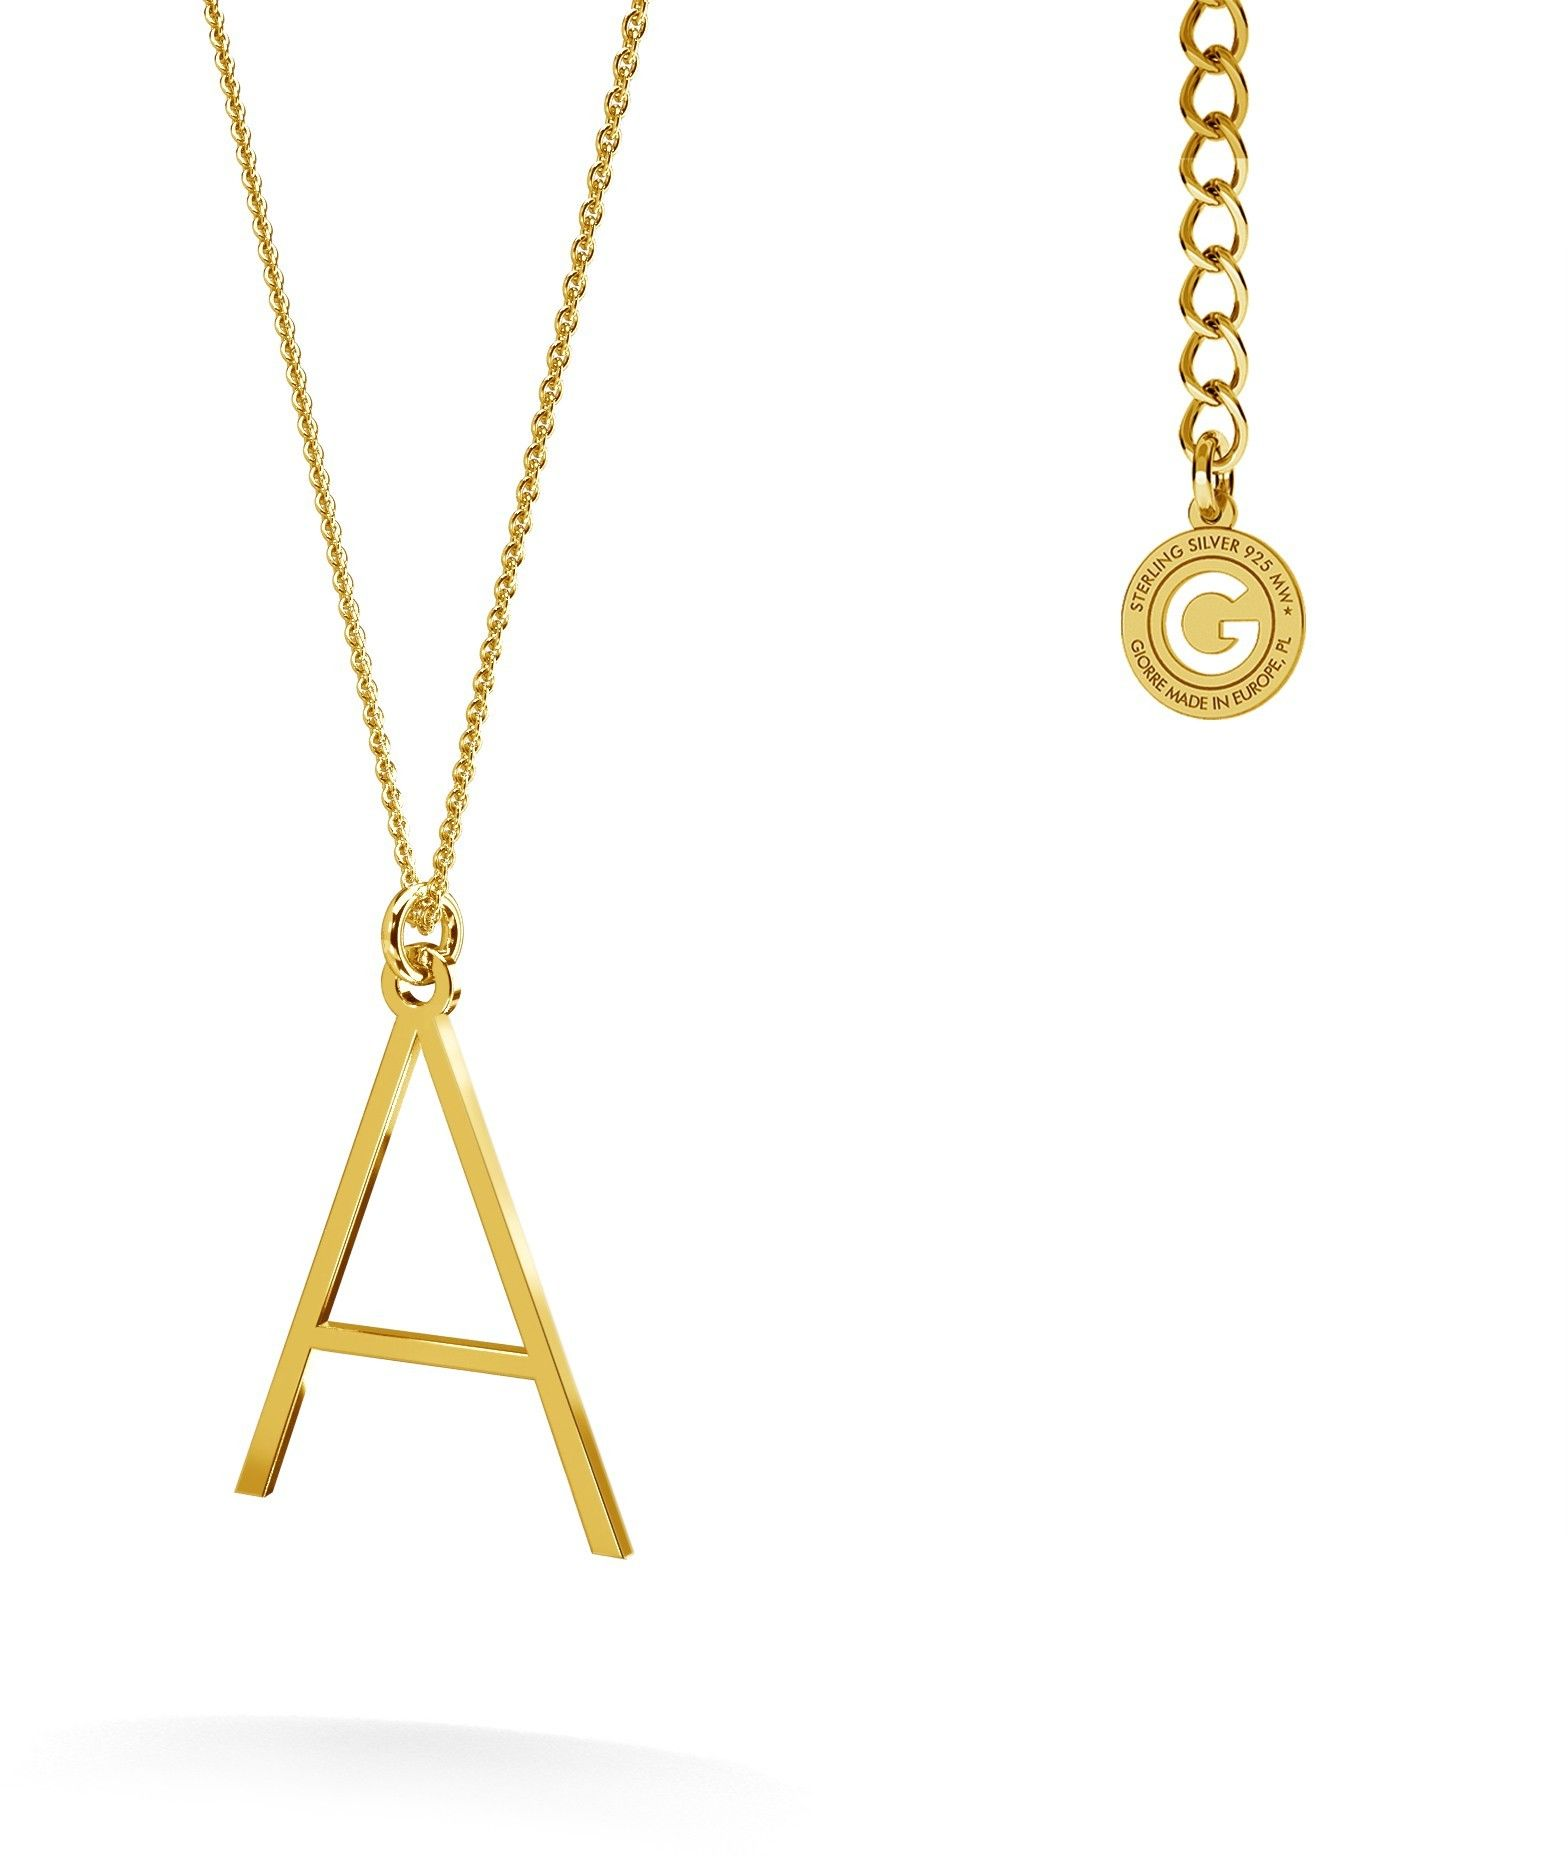 Srebrny naszyjnik z literką, alfabet, srebro 925 : Litera - E, Srebro - kolor pokrycia - Pokrycie platyną